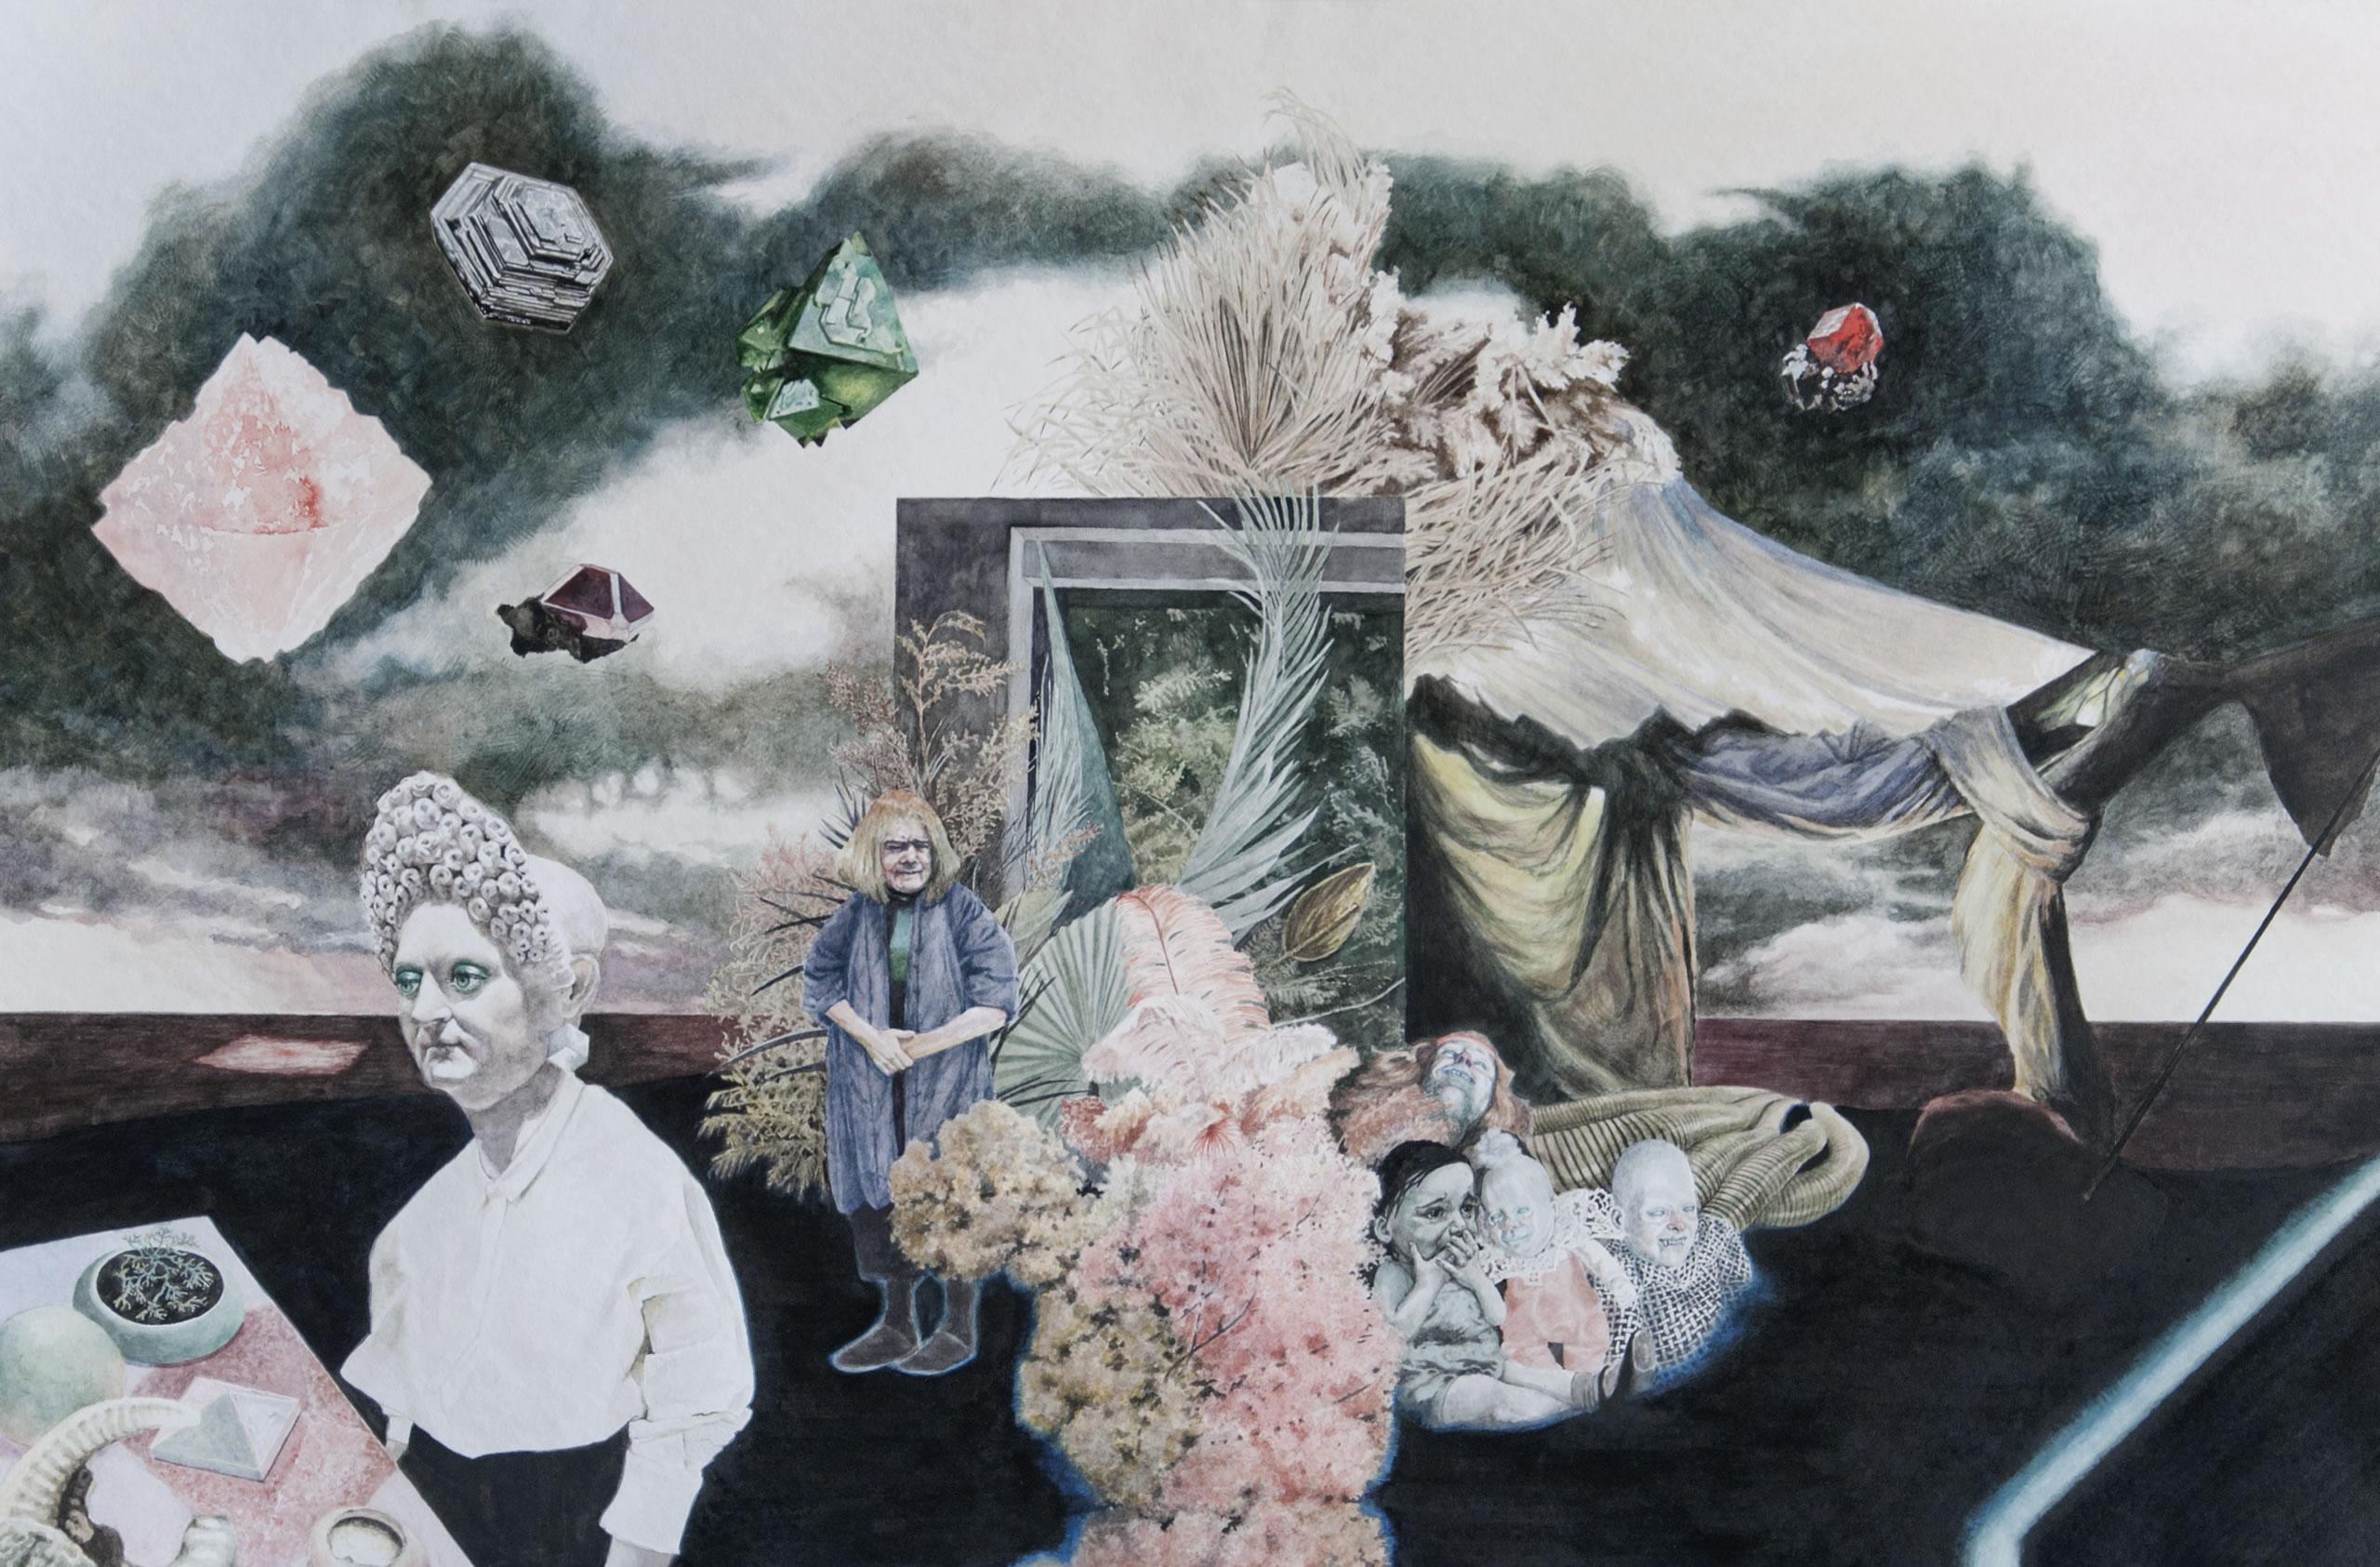 Annemarie Arzberger | Insel | 2019 | 56 x 86 cm | Aquarell | Foto: Manuel Obriejetan | Parallel Vienna 2019 | Galerie3